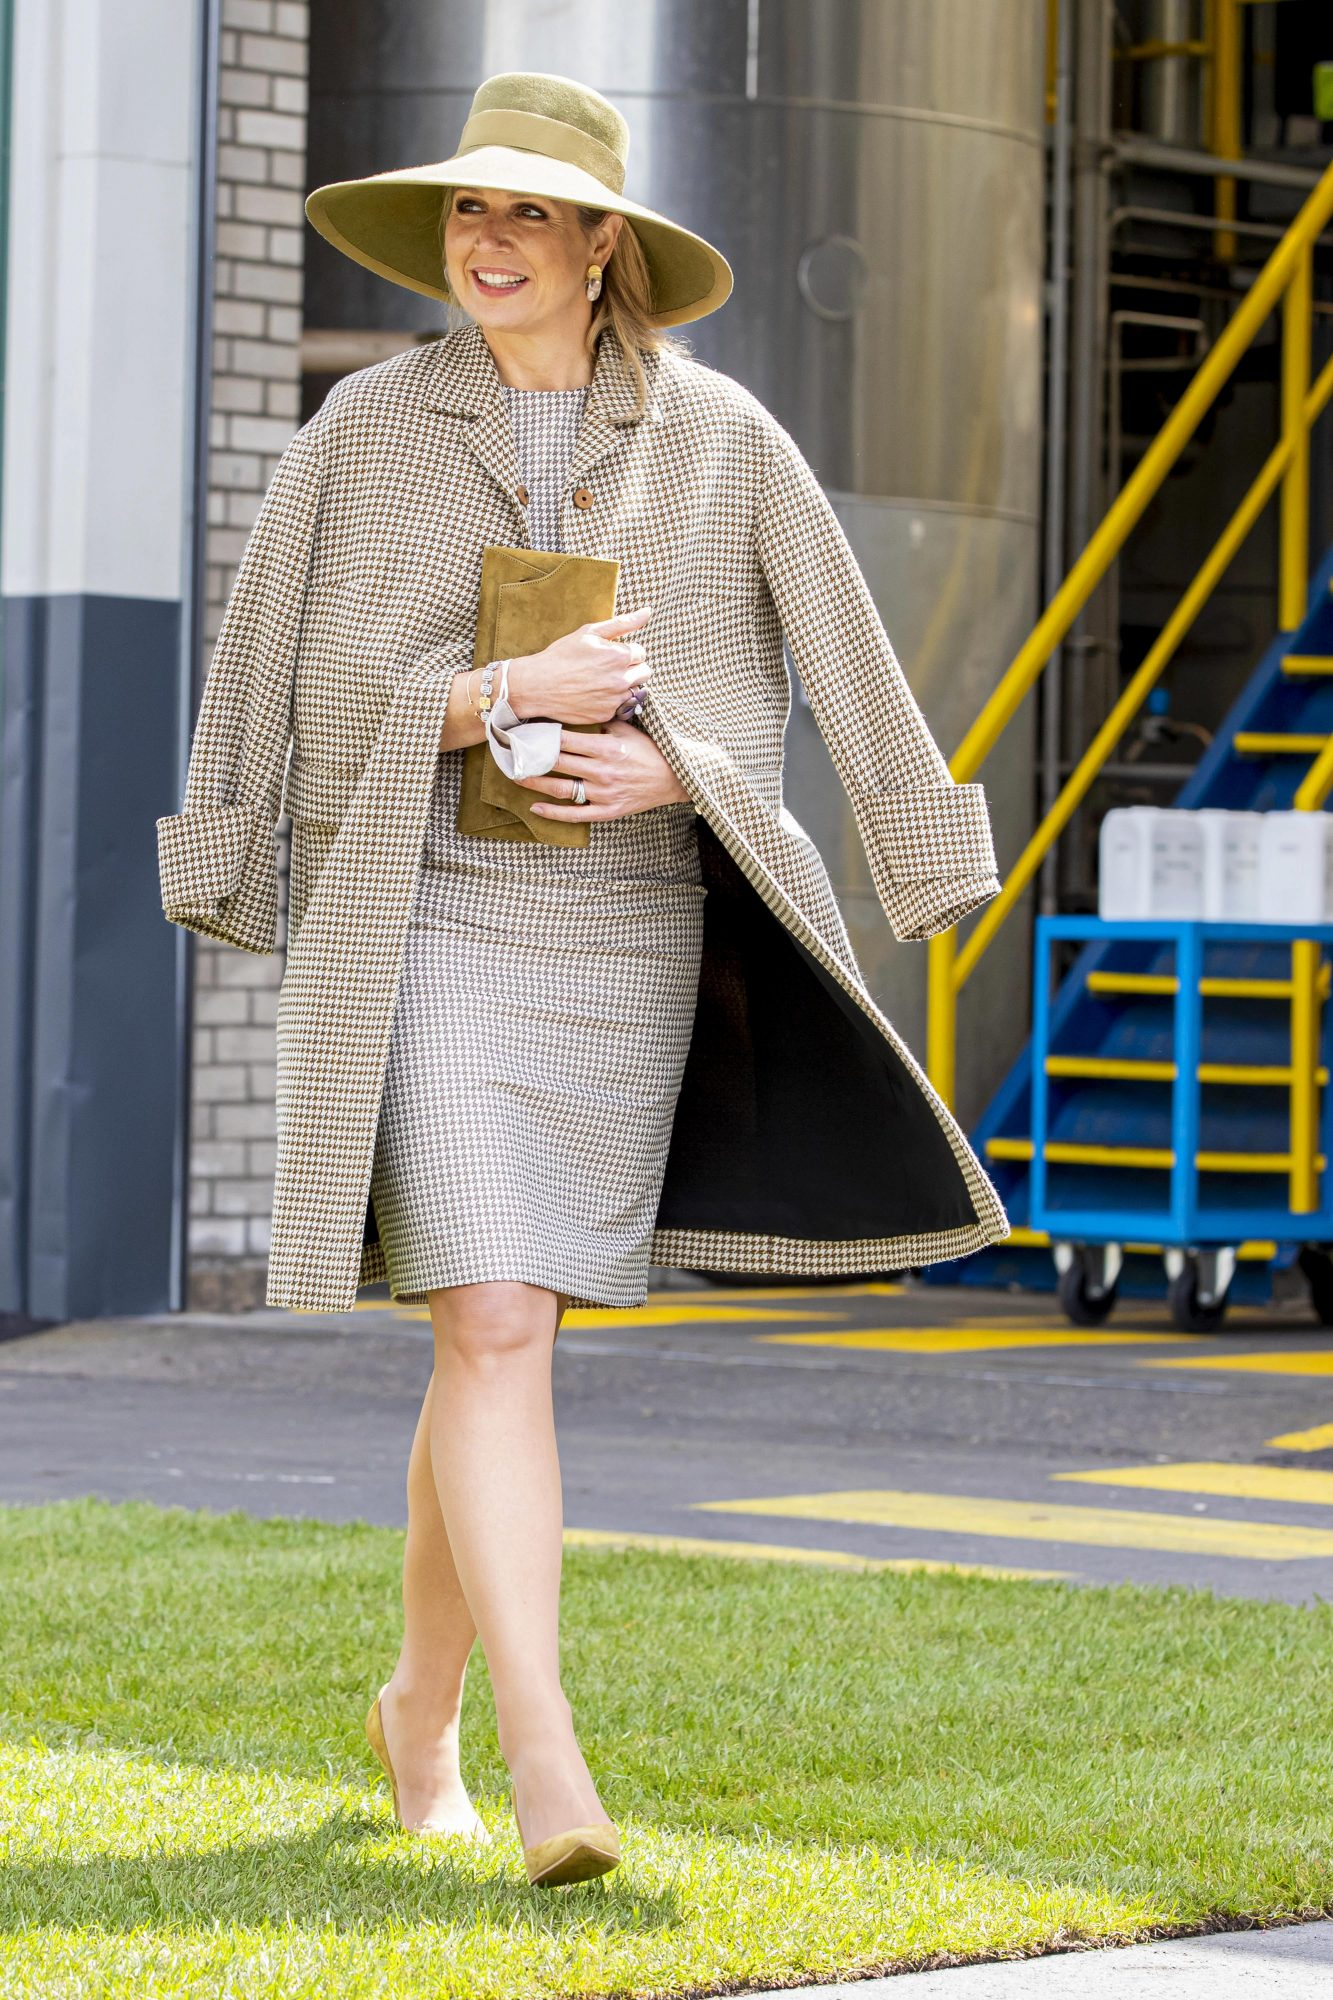 Reina Maxima de Holanda, look del dia, vestido a cuadros